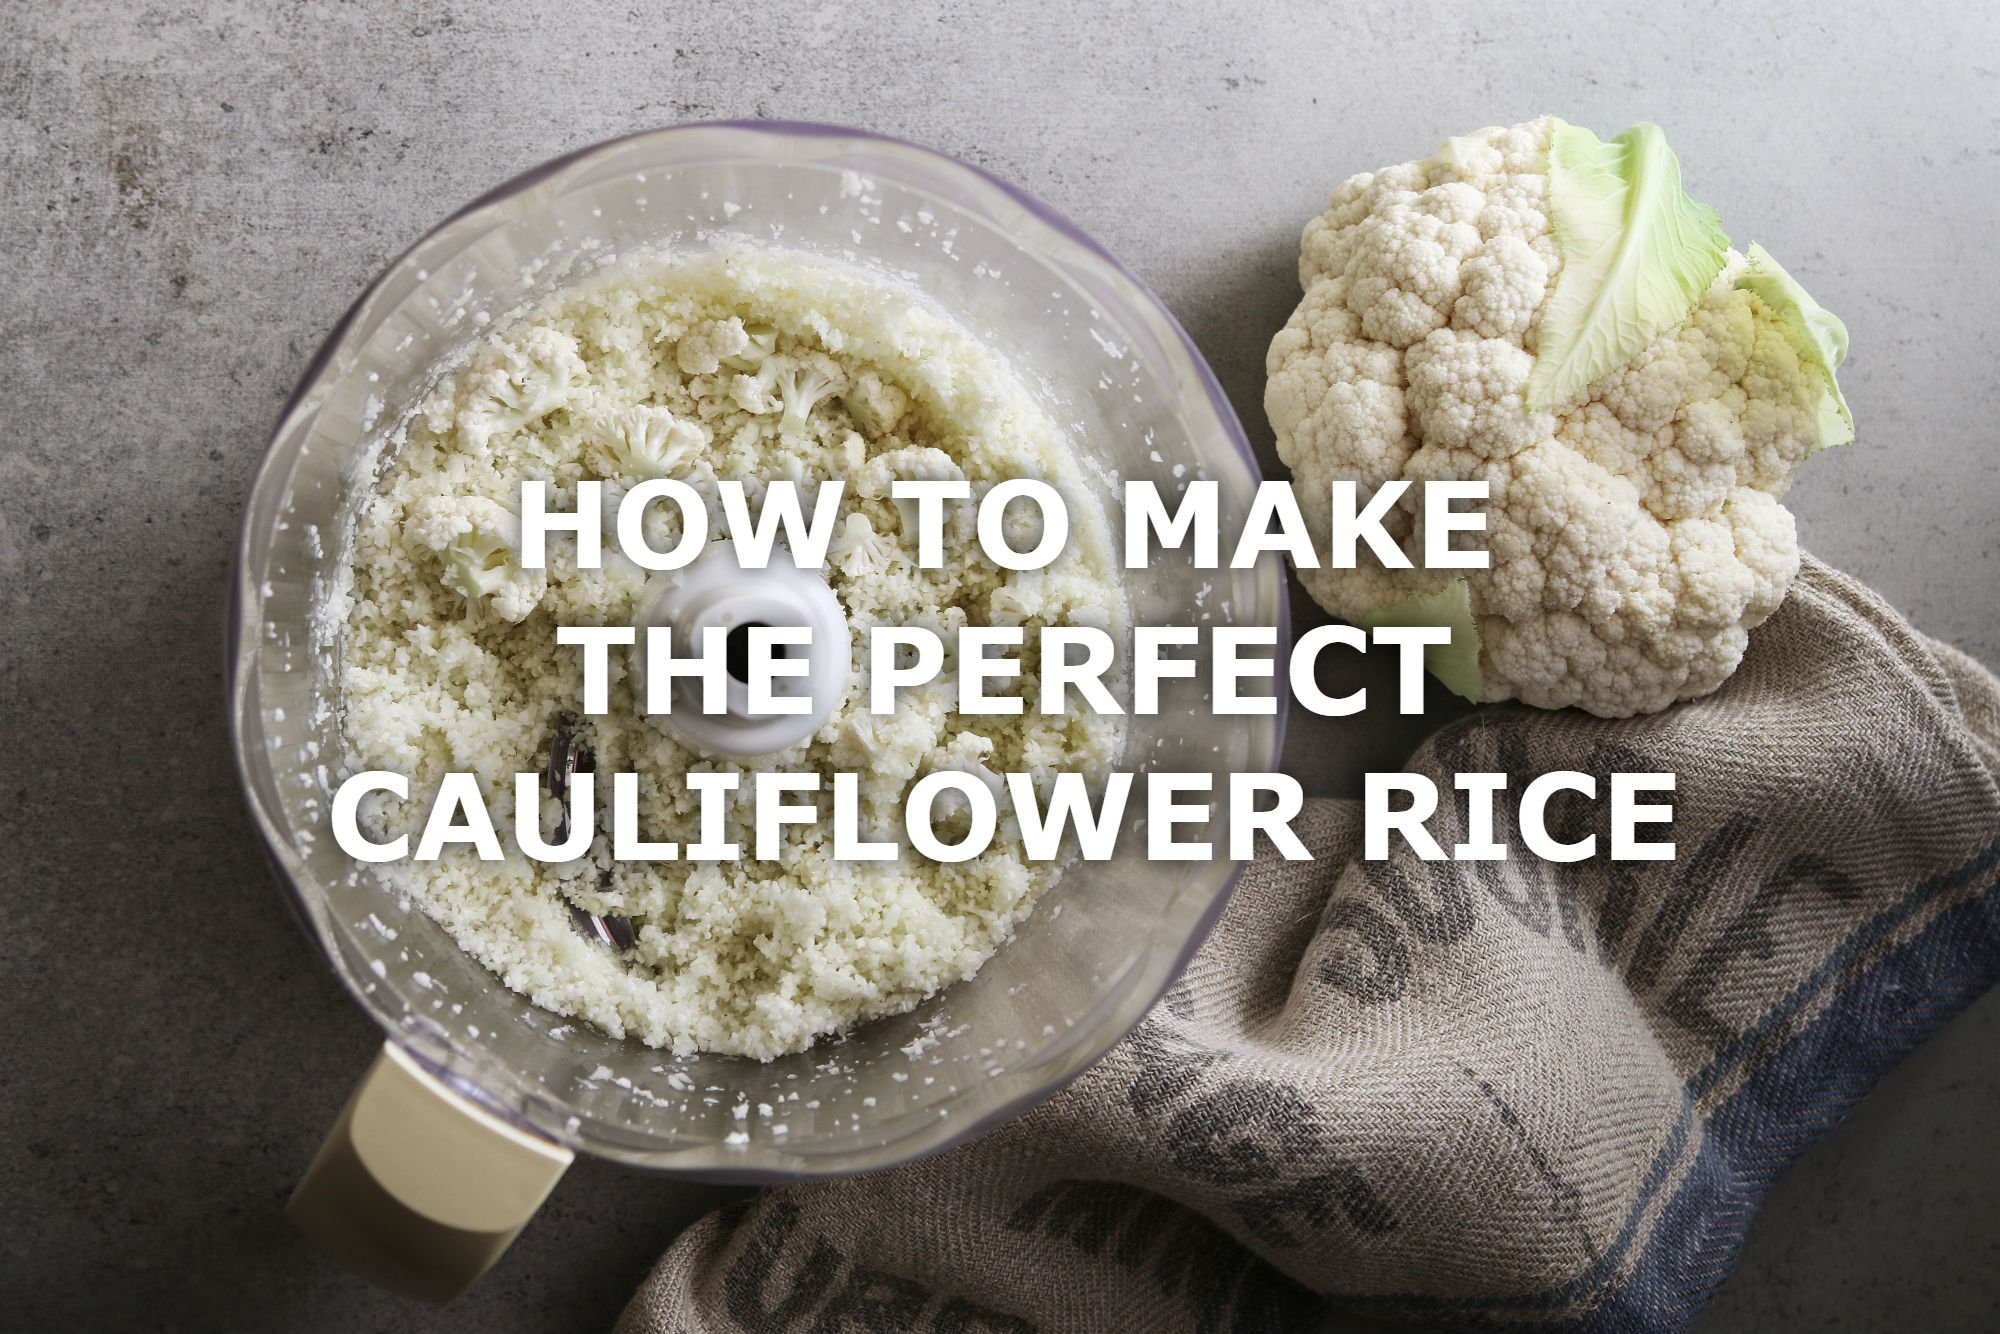 How To Make The Perfect Cauliflower Rice